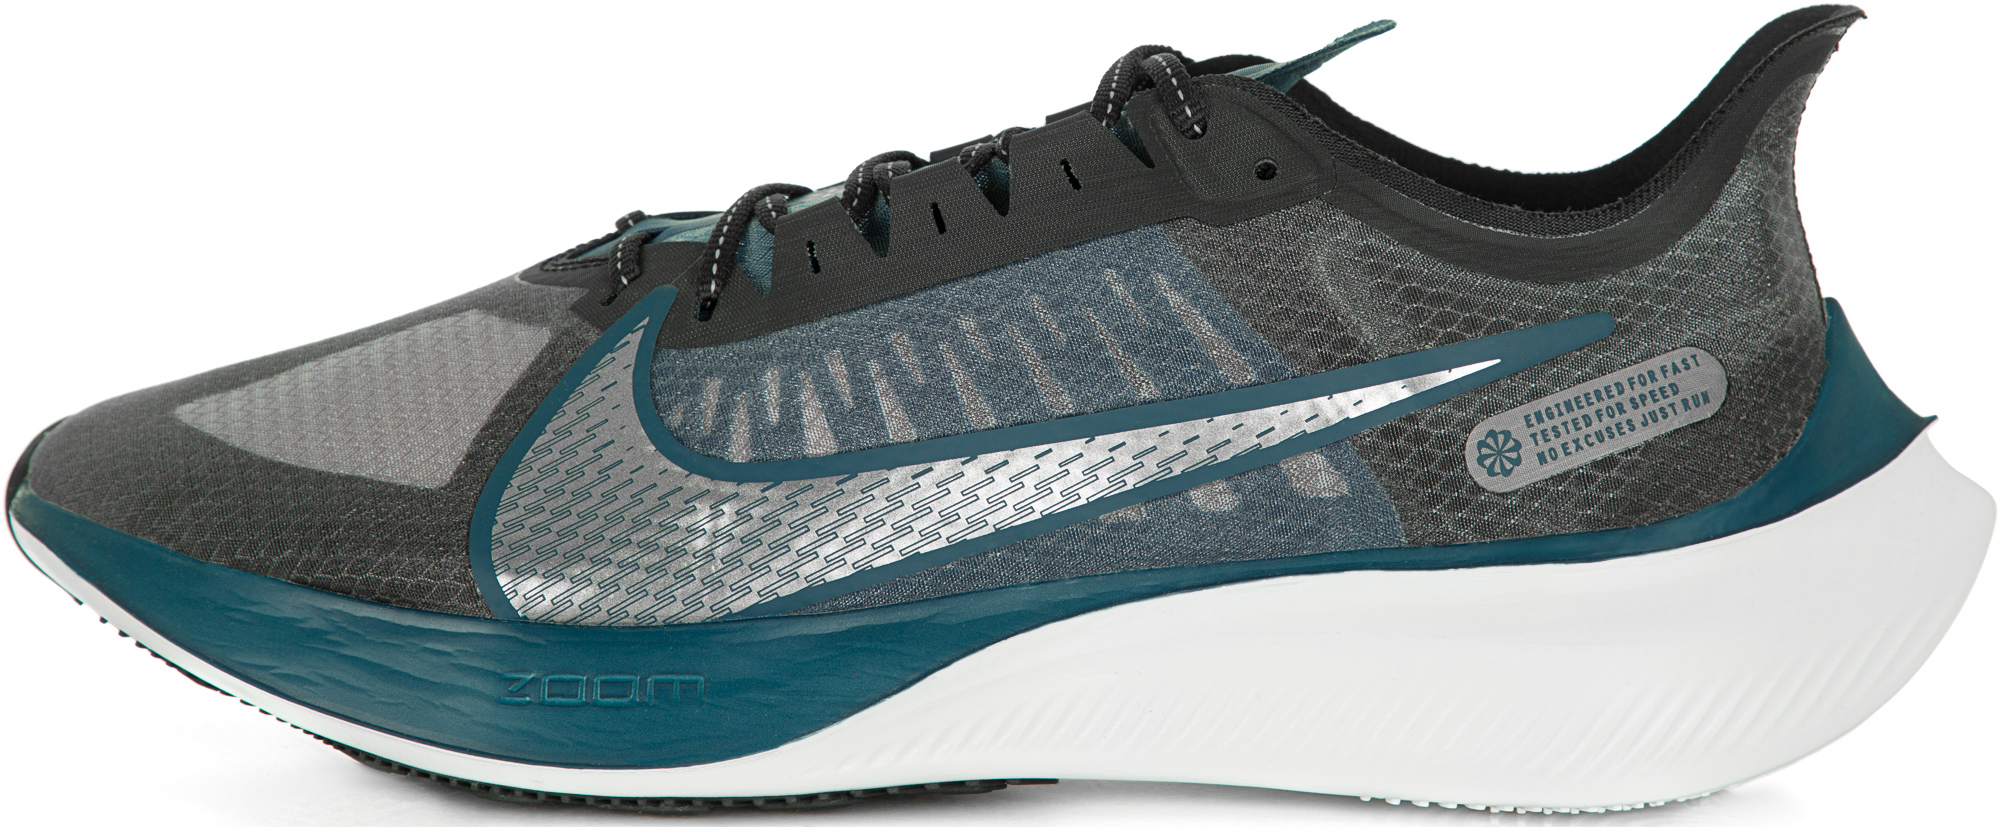 Nike Кроссовки мужские Nike Zoom Gravity, размер 45 стоимость